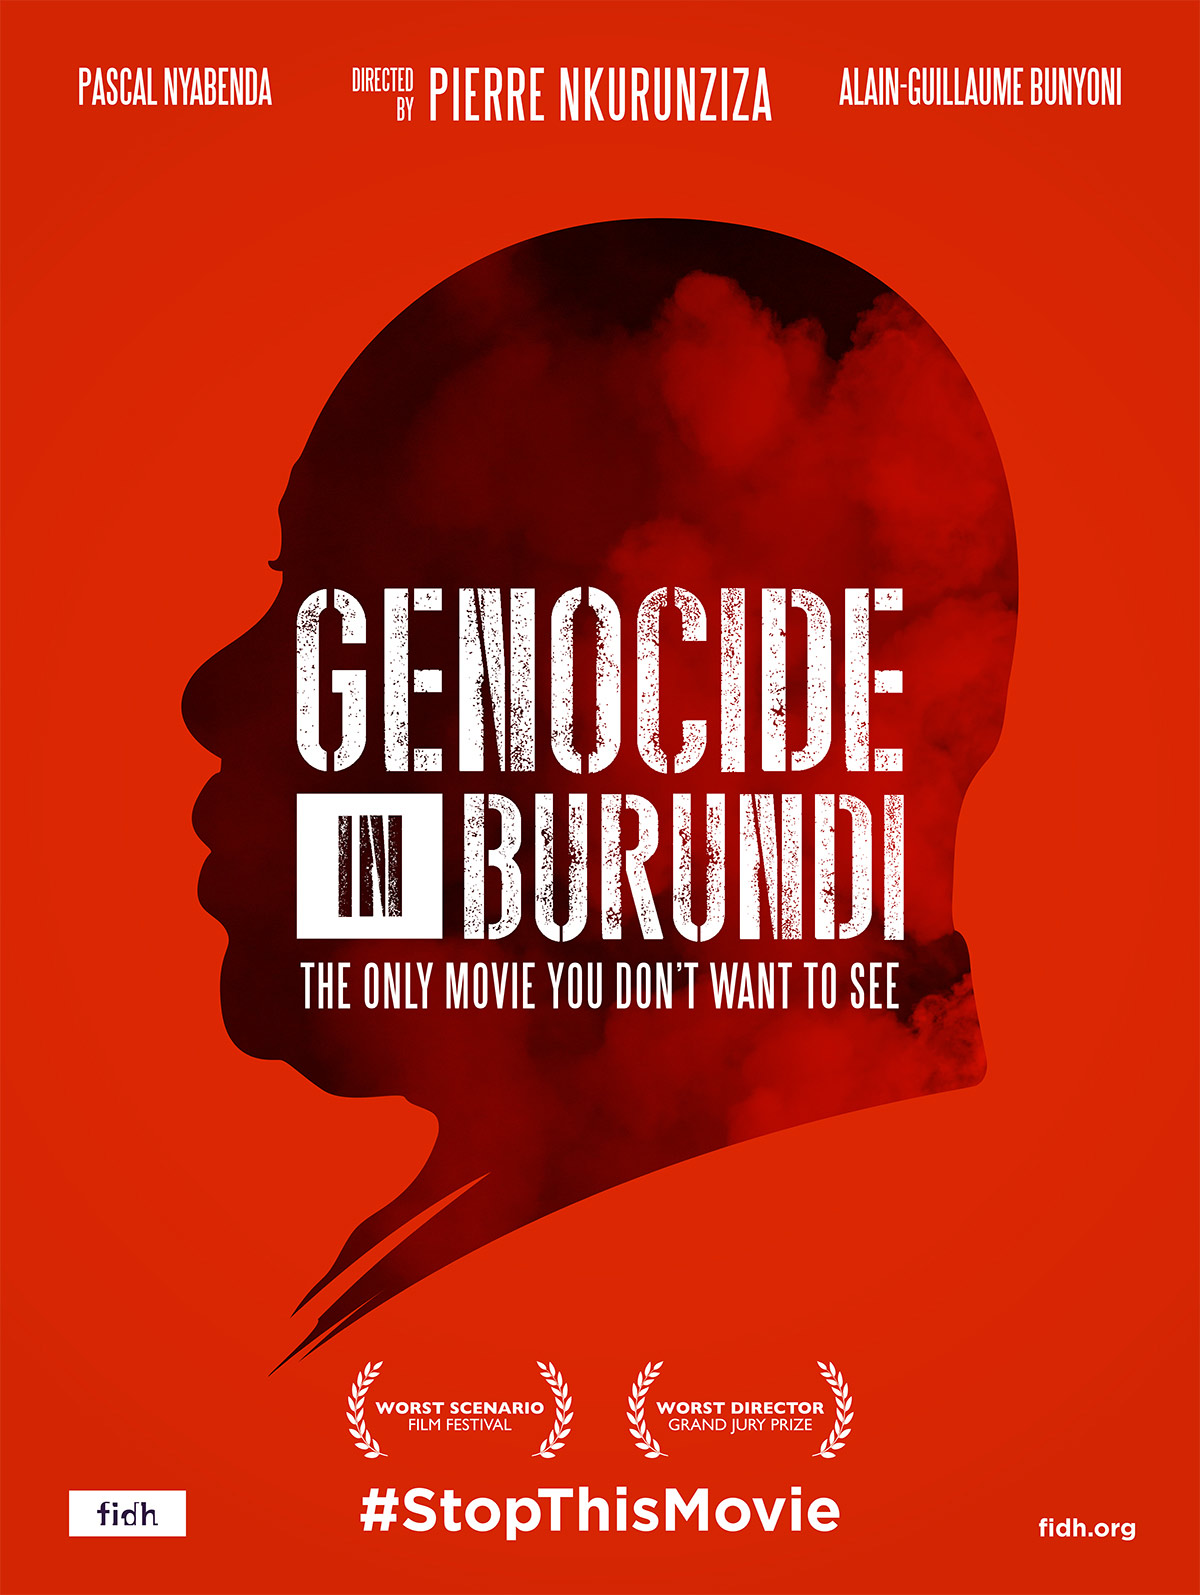 KR_1611_Burundi_#Stopthismovie_FIDH-movie_poster